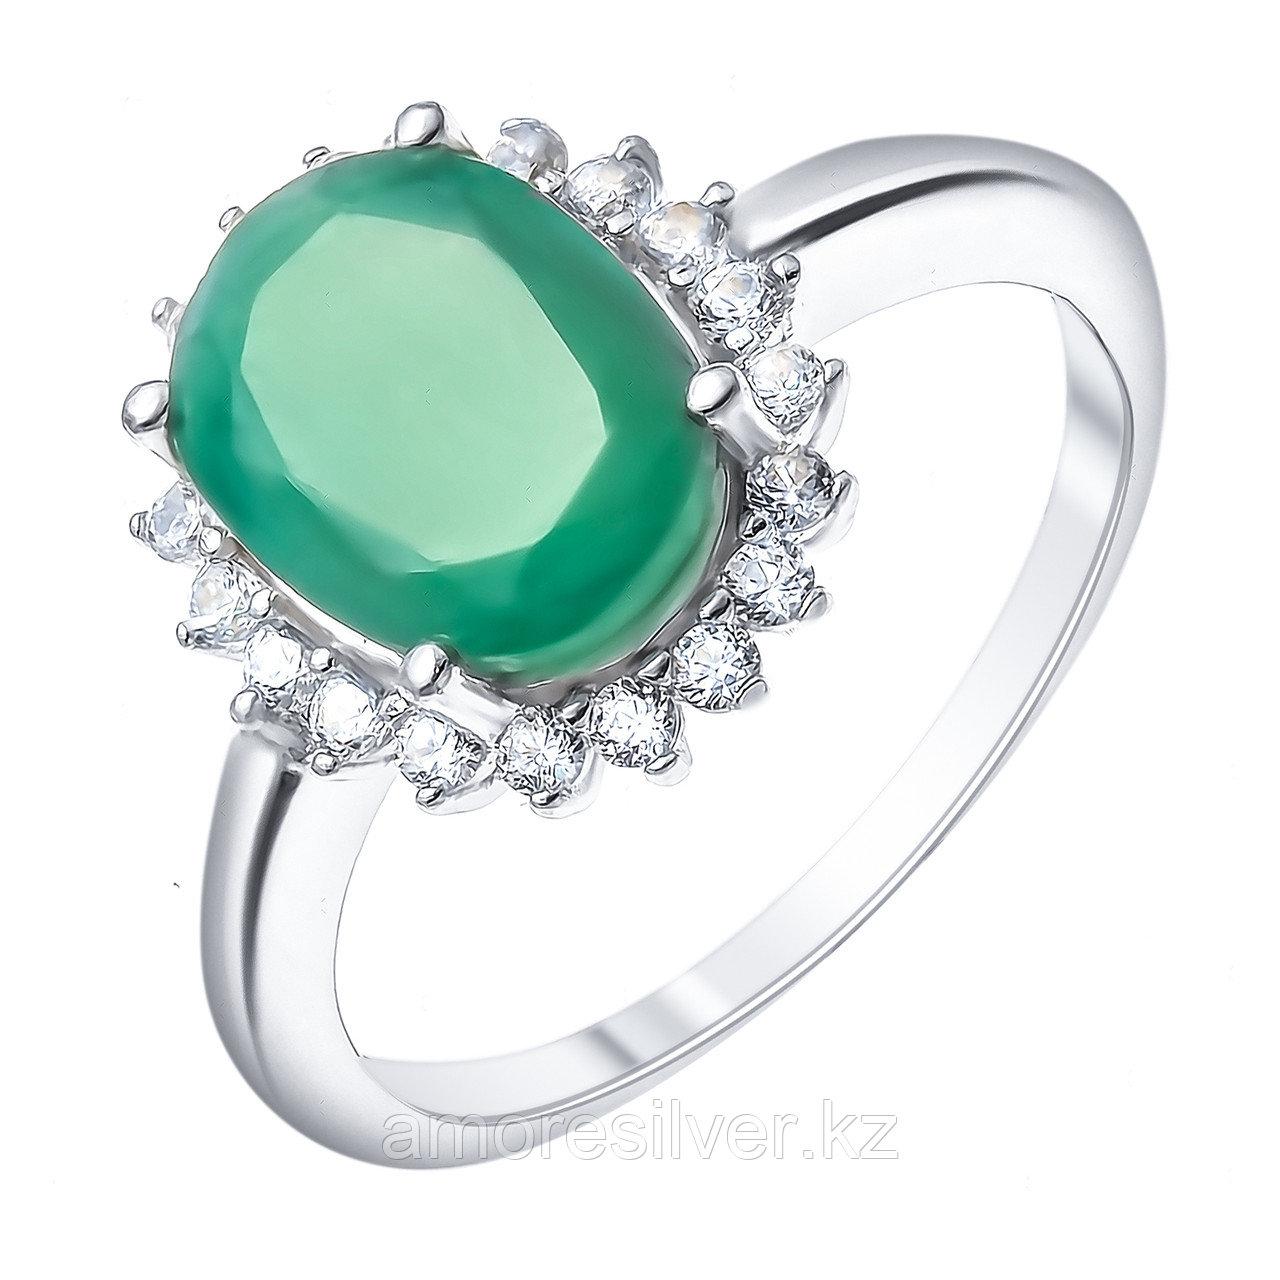 "Кольцо Teosa серебро с родием, изумруд топаз, ""halo"" R-DRGR00685-EM-T размеры - 17,5"